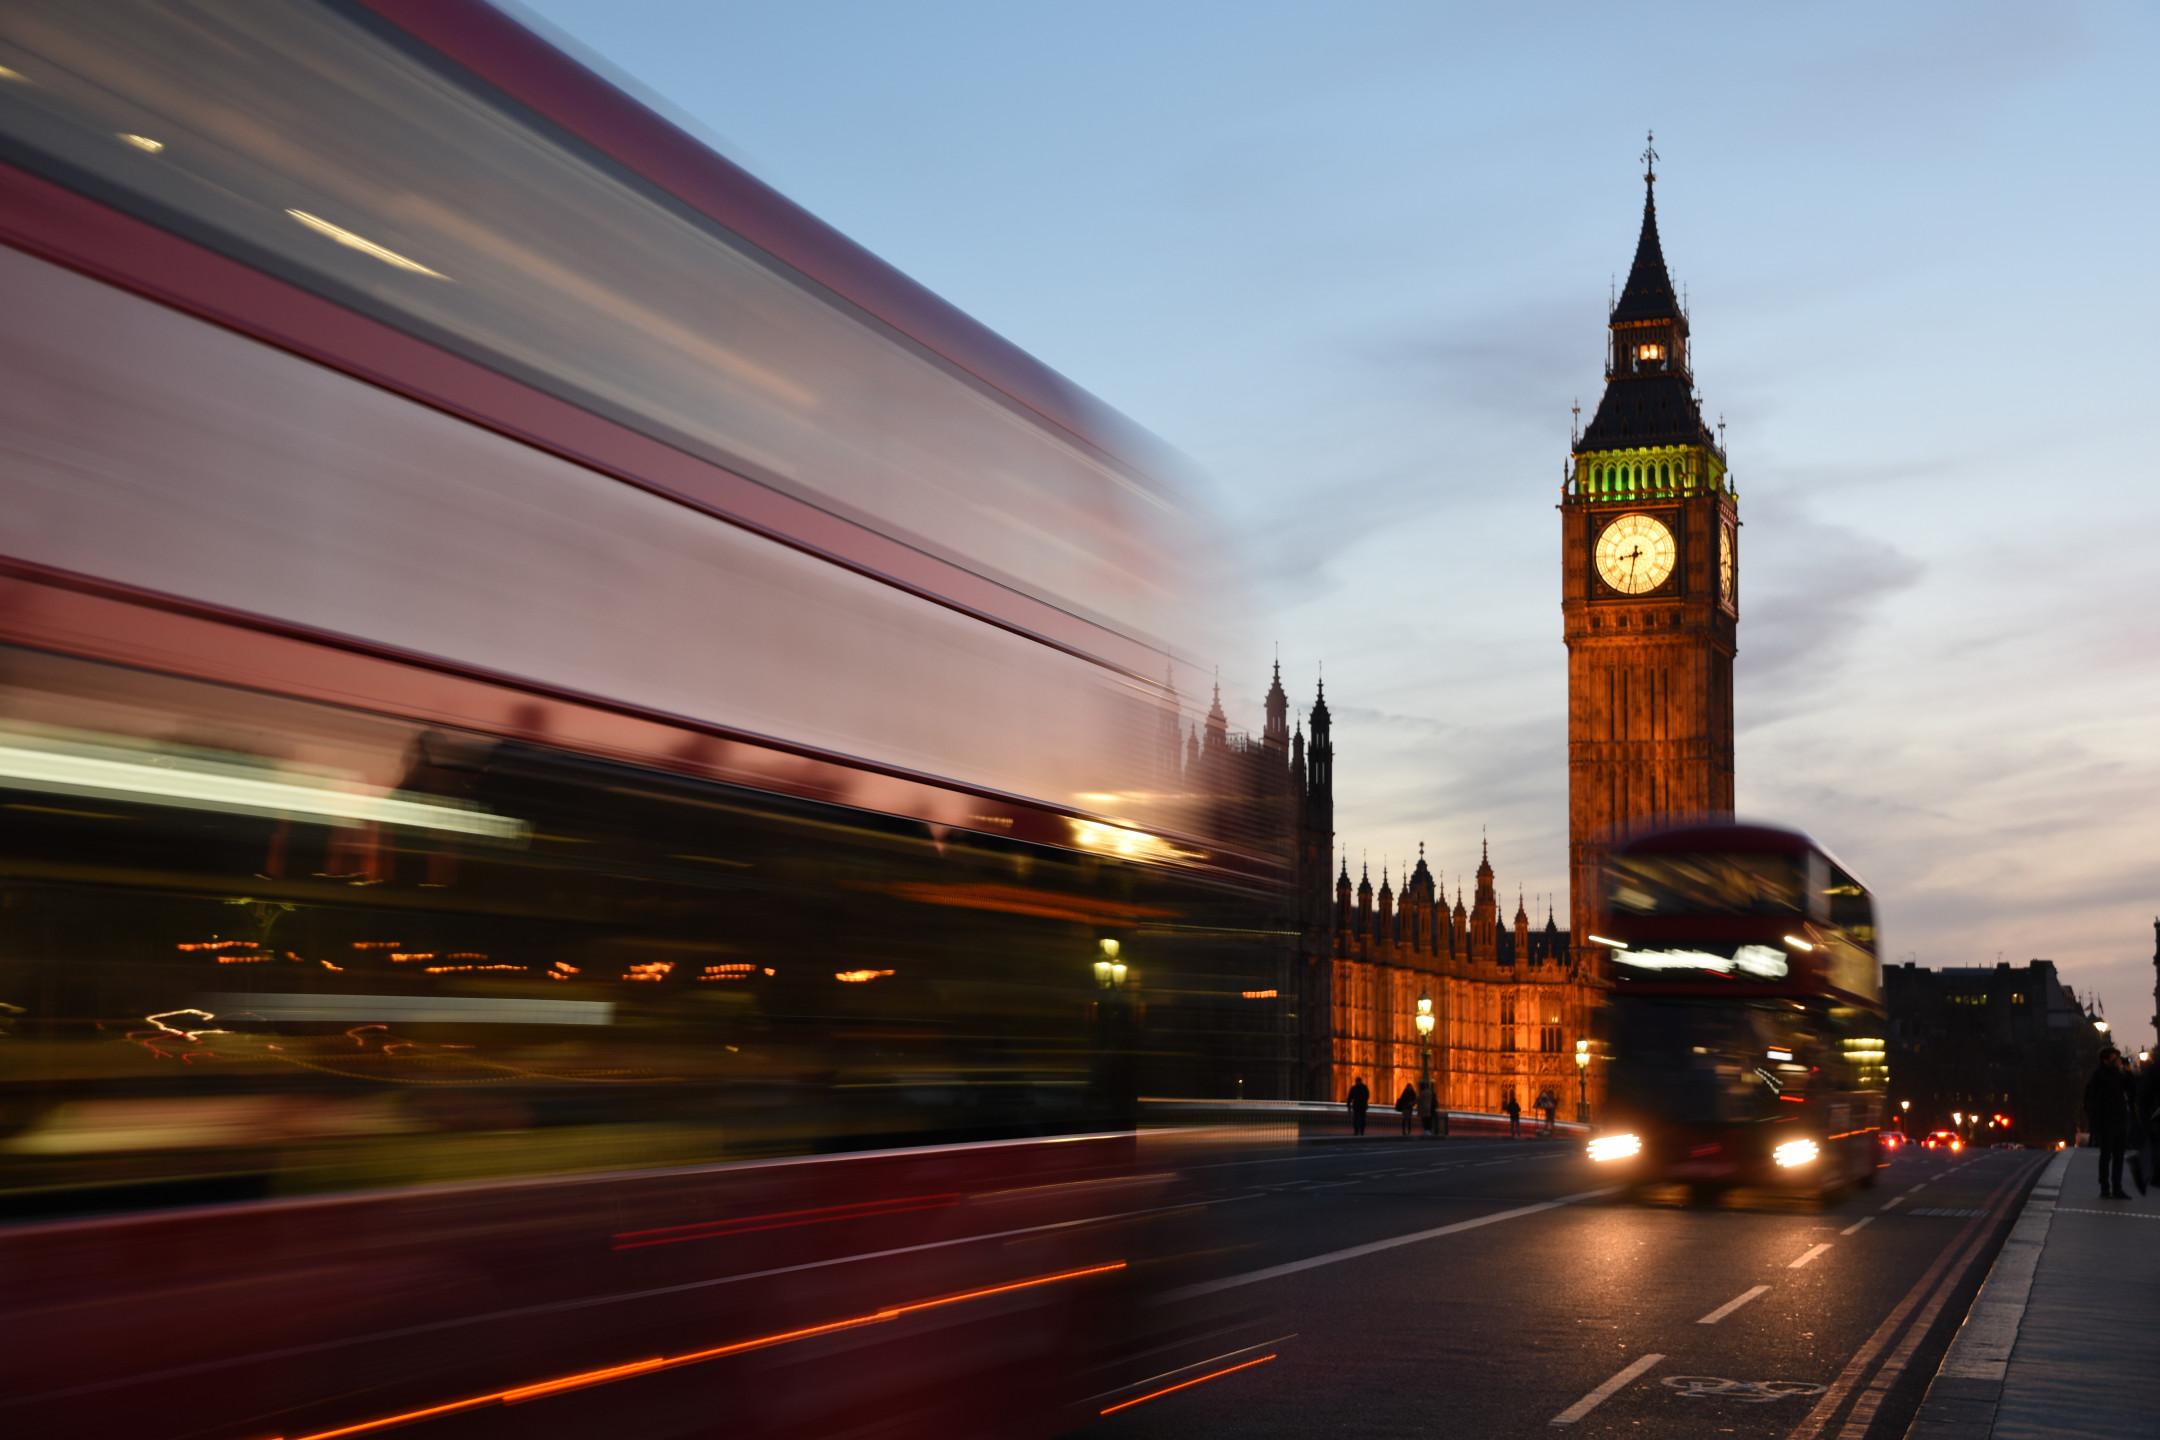 How do UK retail sales impact GBPUSD?